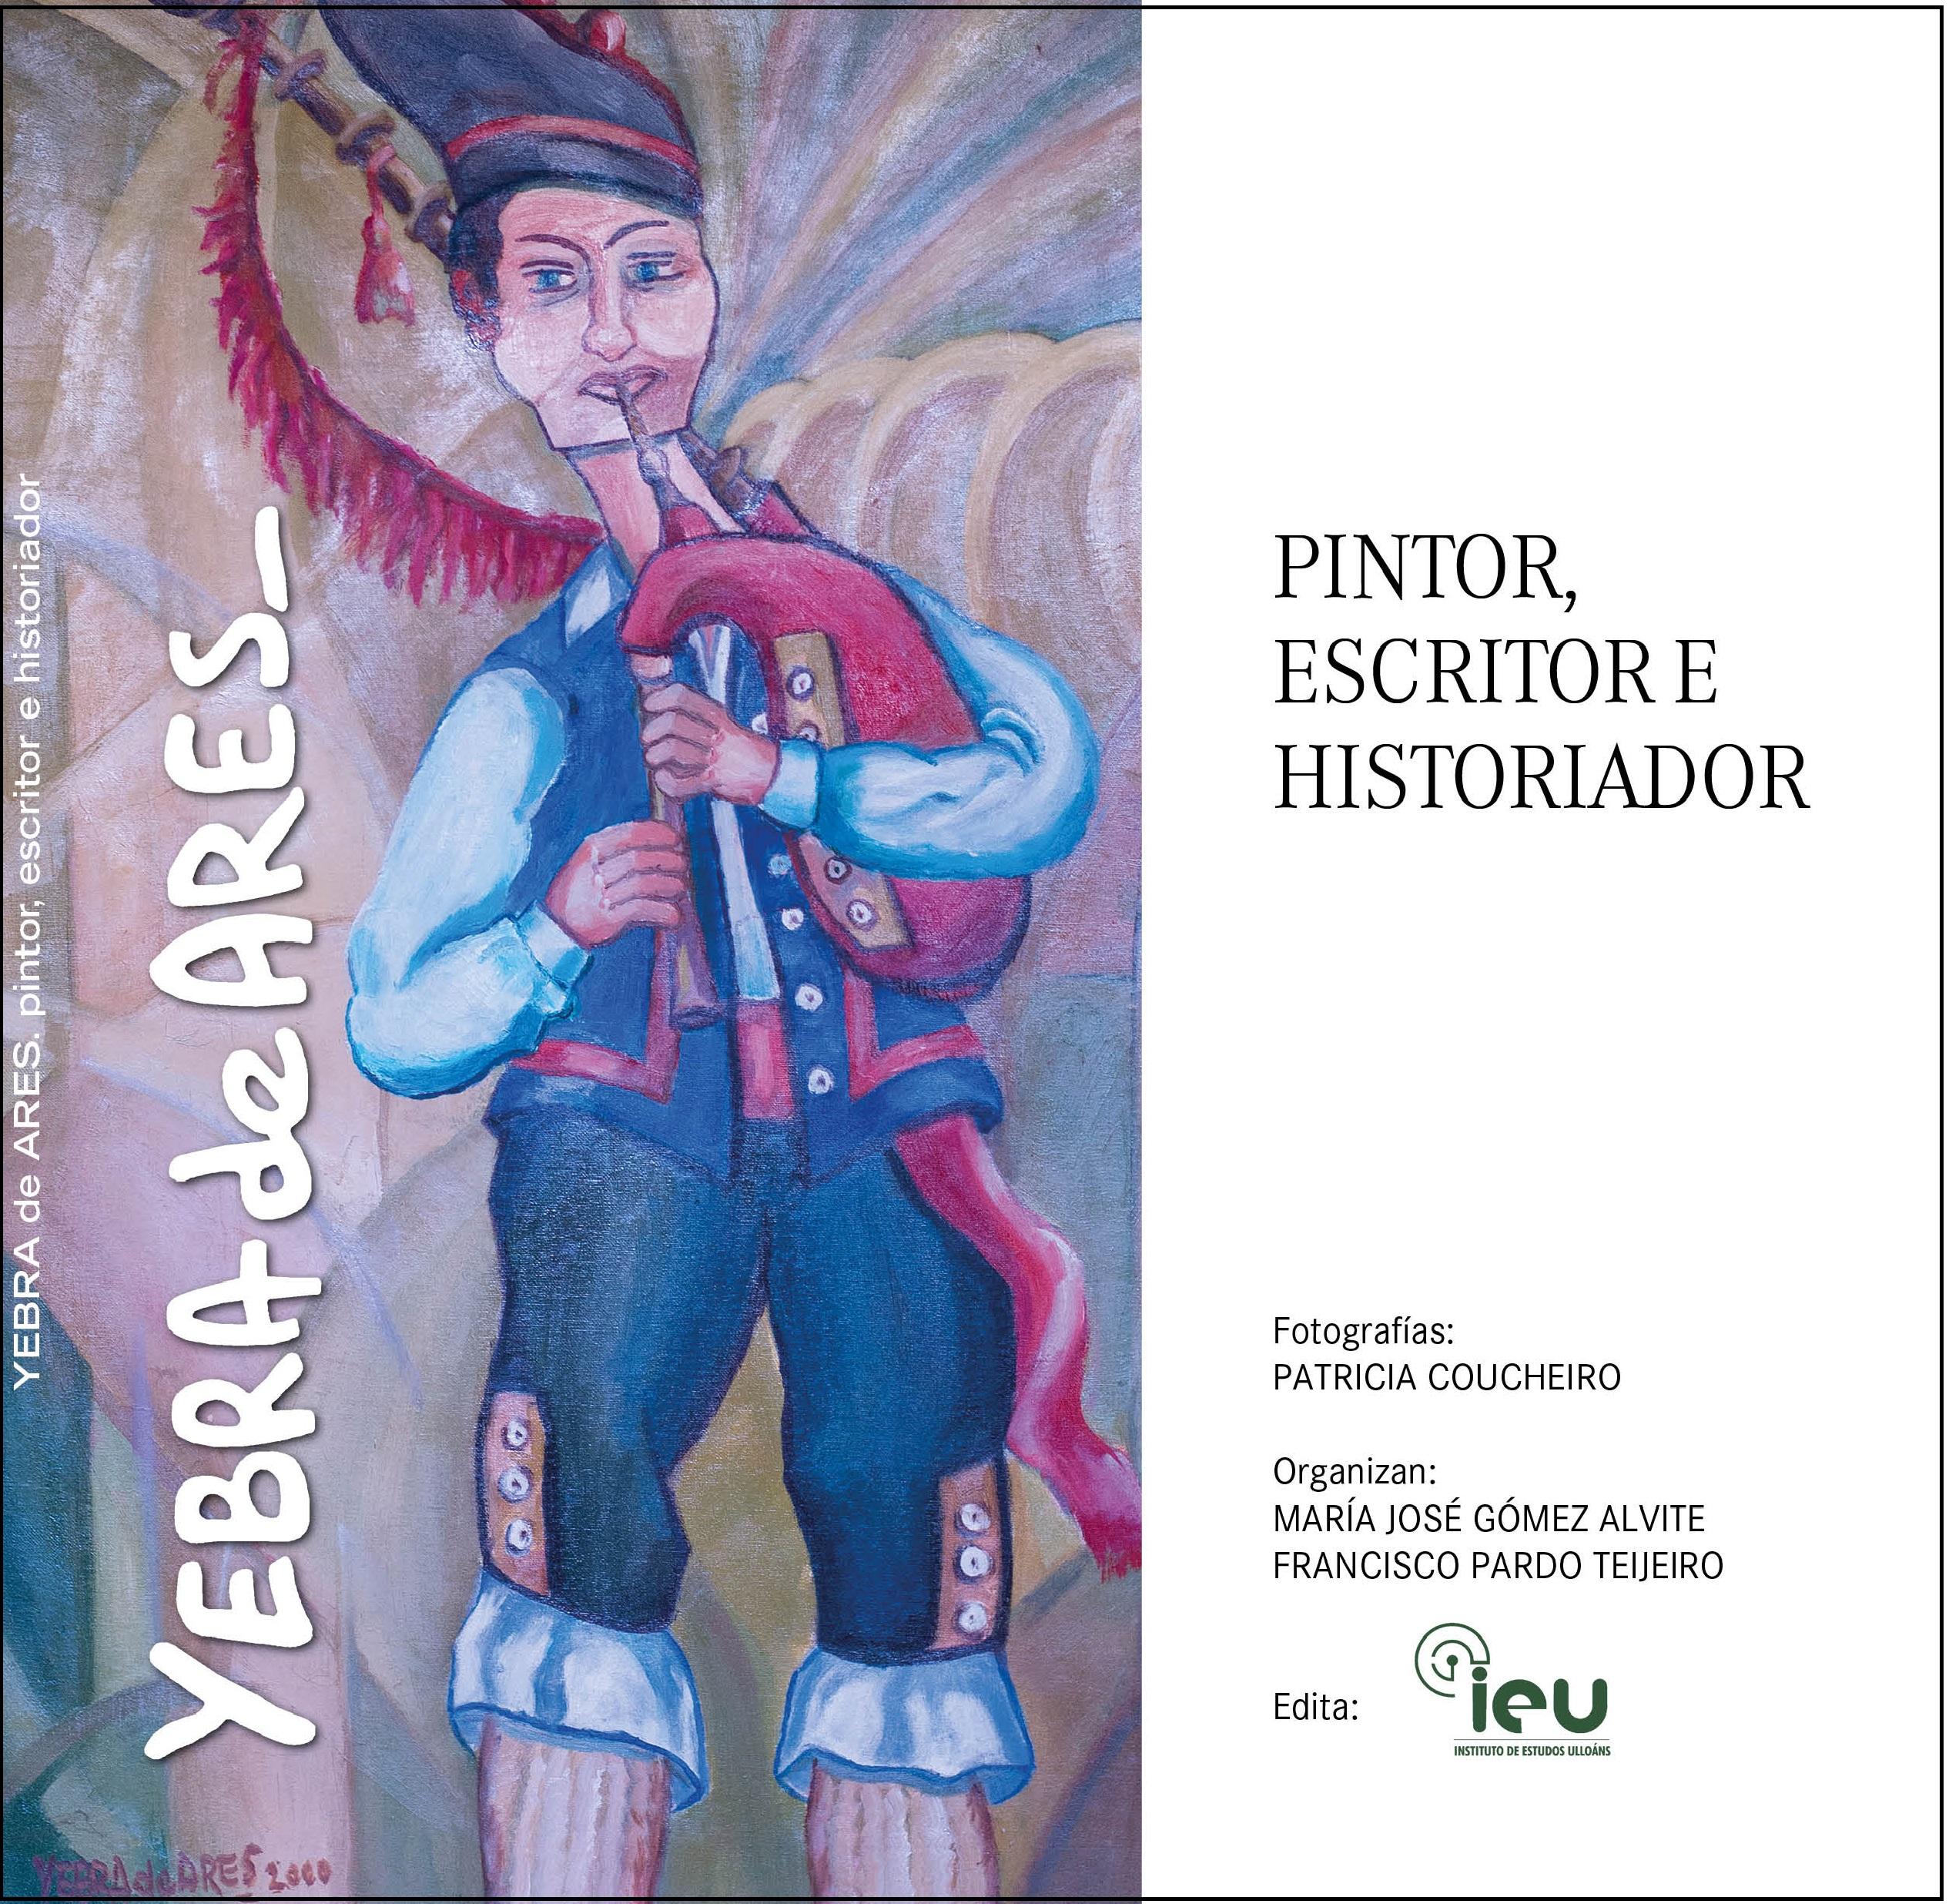 Portada catalogo expo Yebra de Ares, Instituto de Estudos lloáns 1